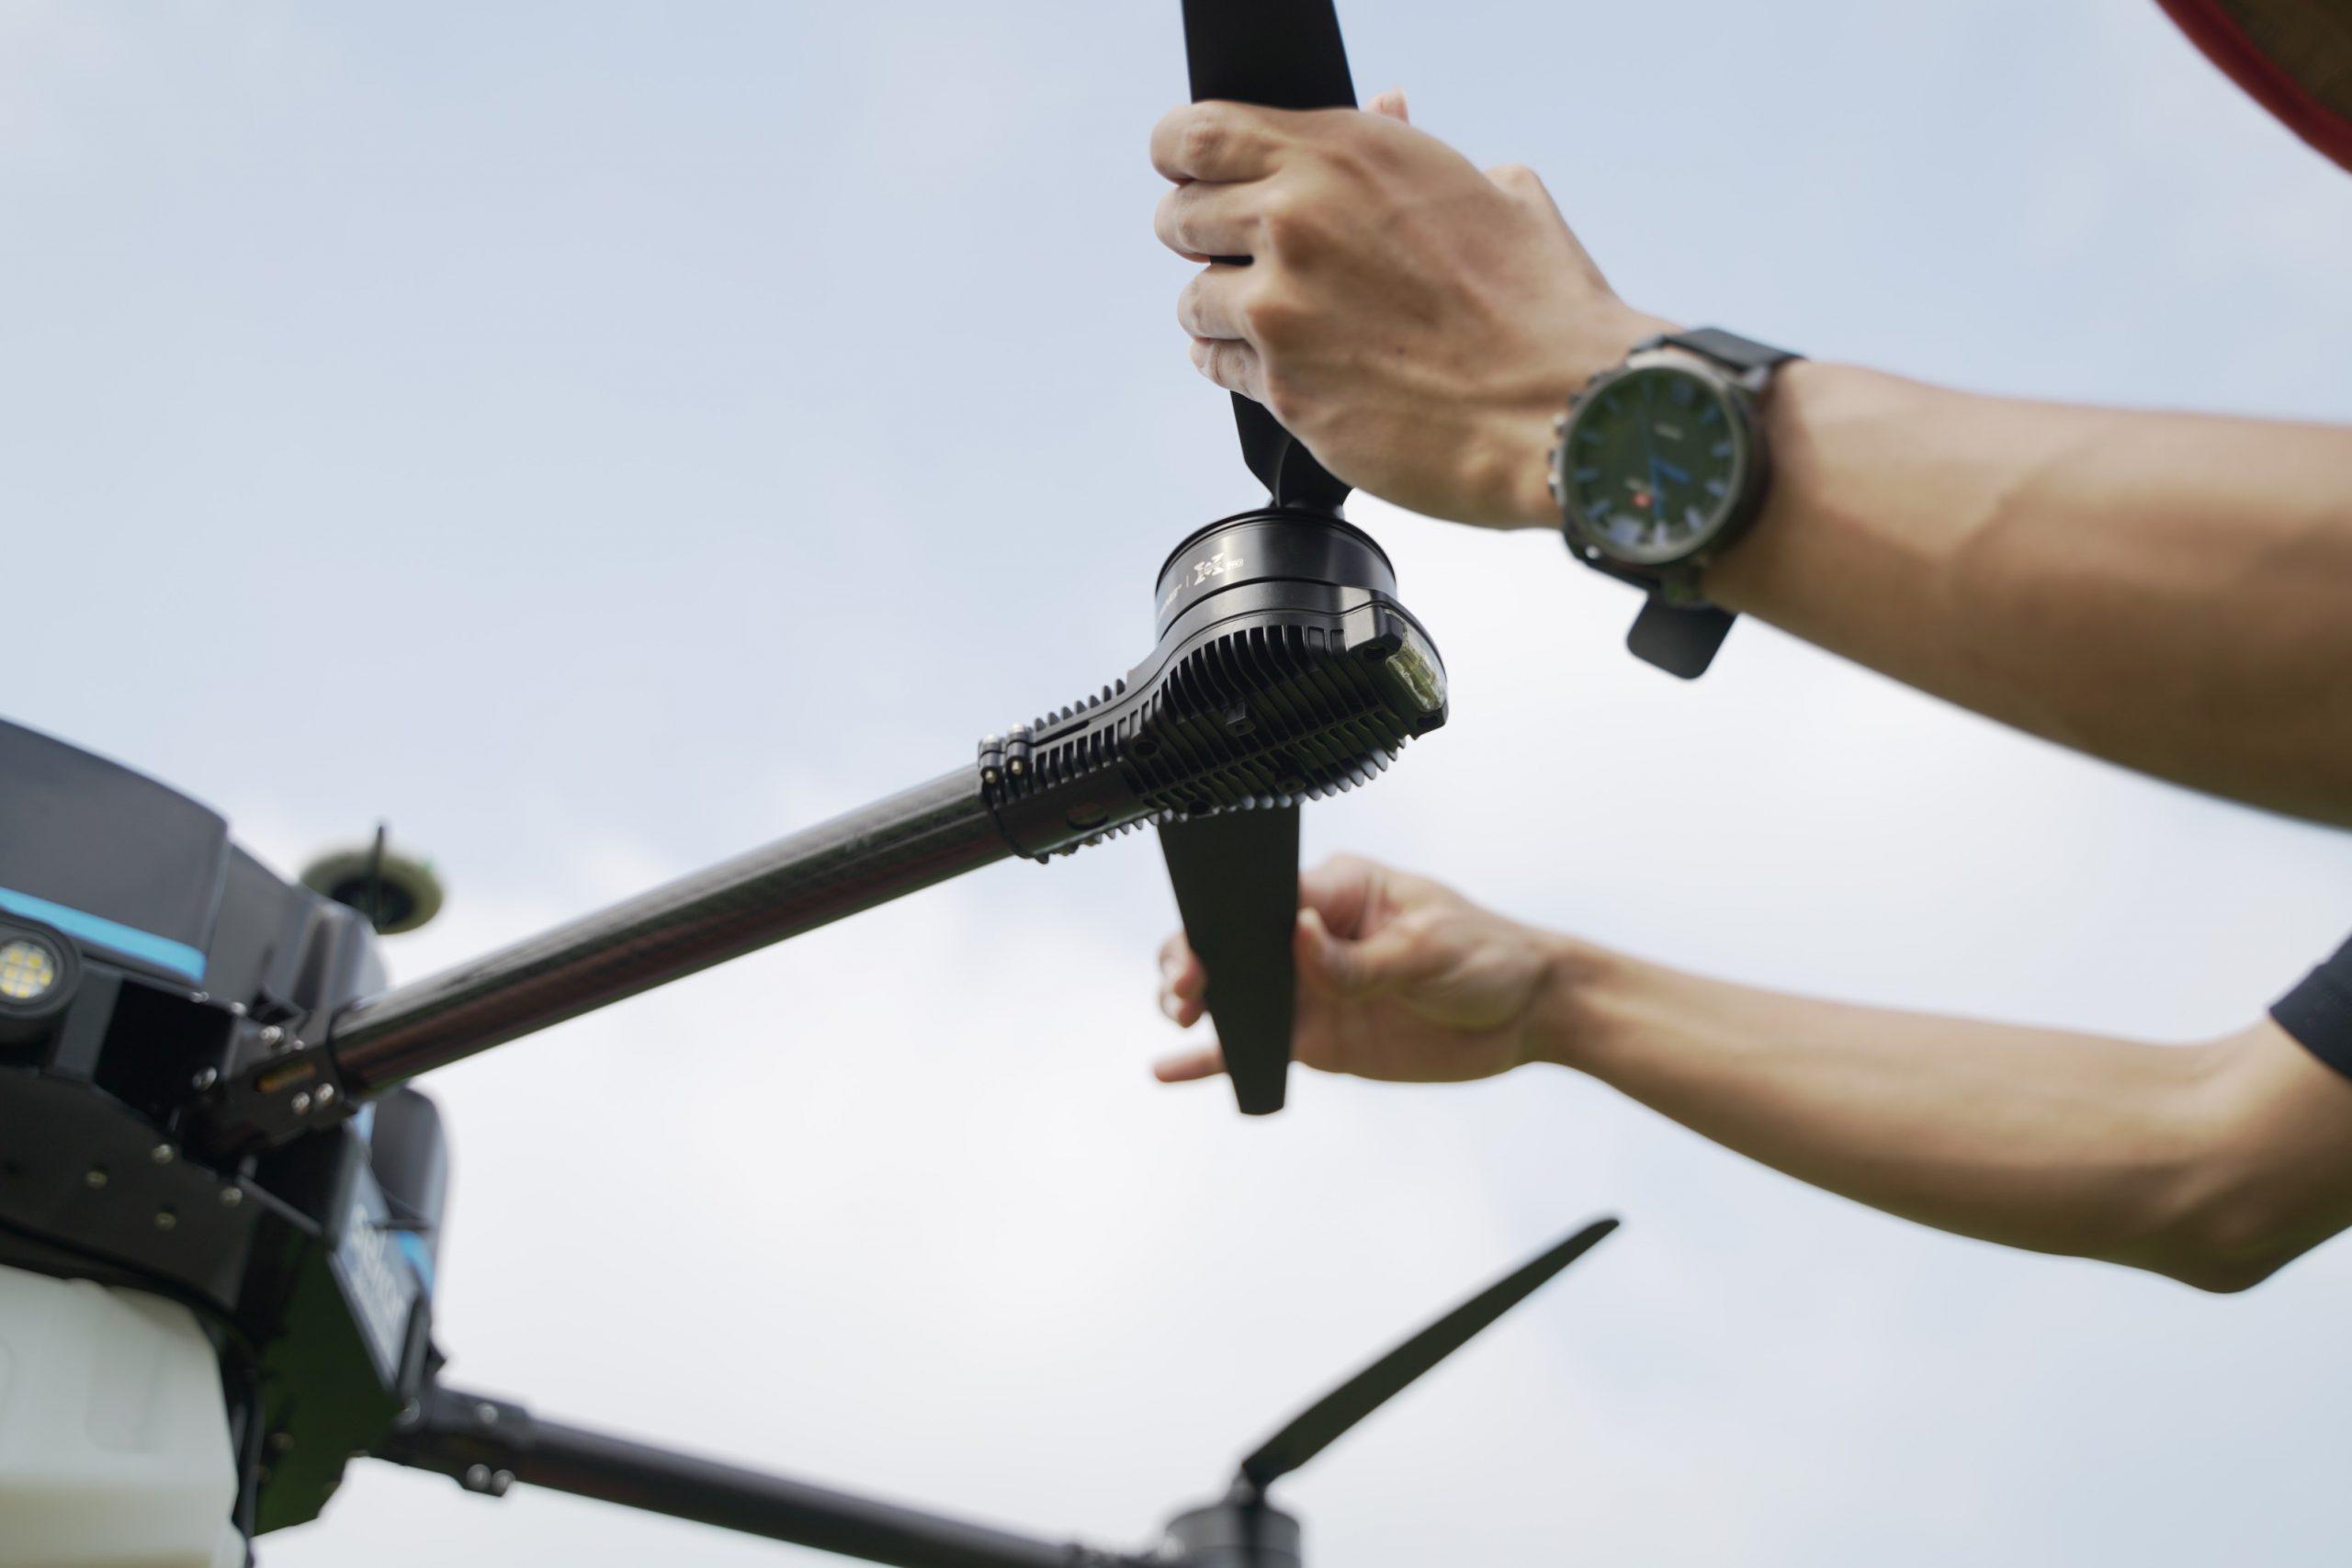 Tahapan Pengoperasian Sekar Agri Drone Sprayer